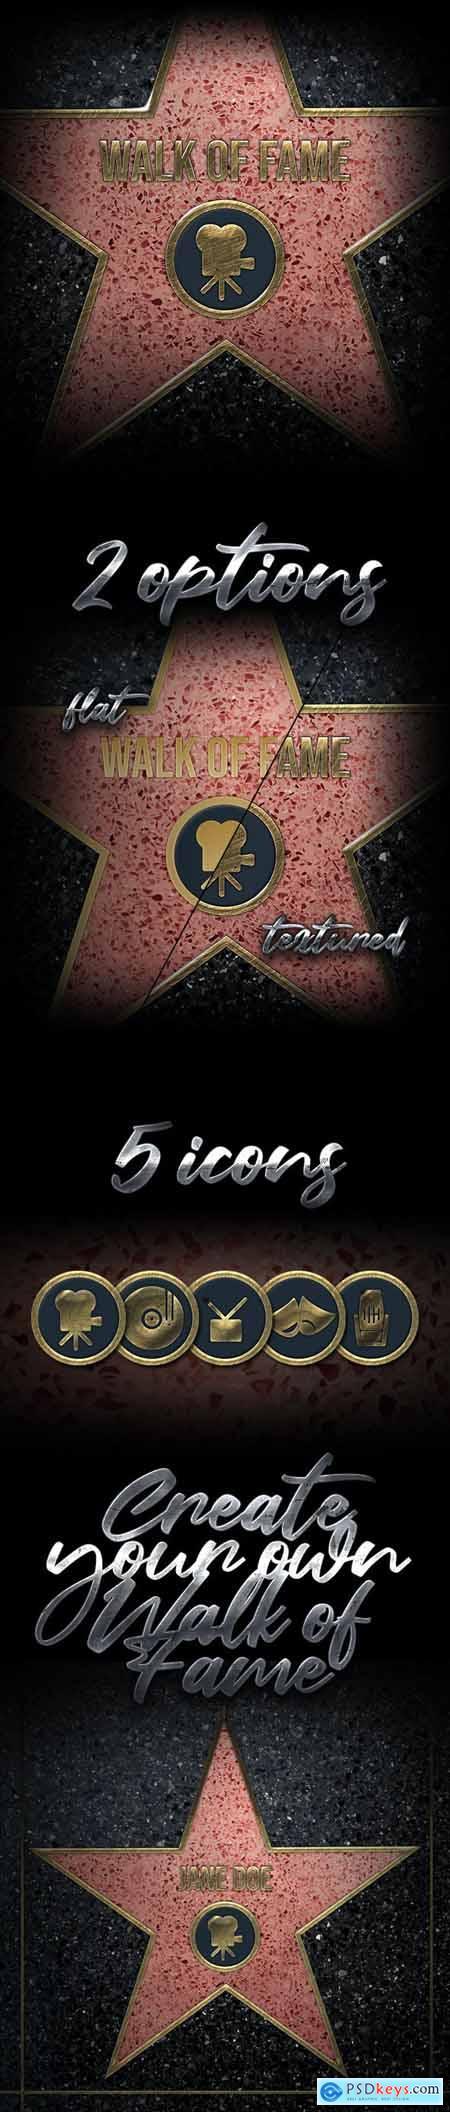 Walk of Fame Star 25879251